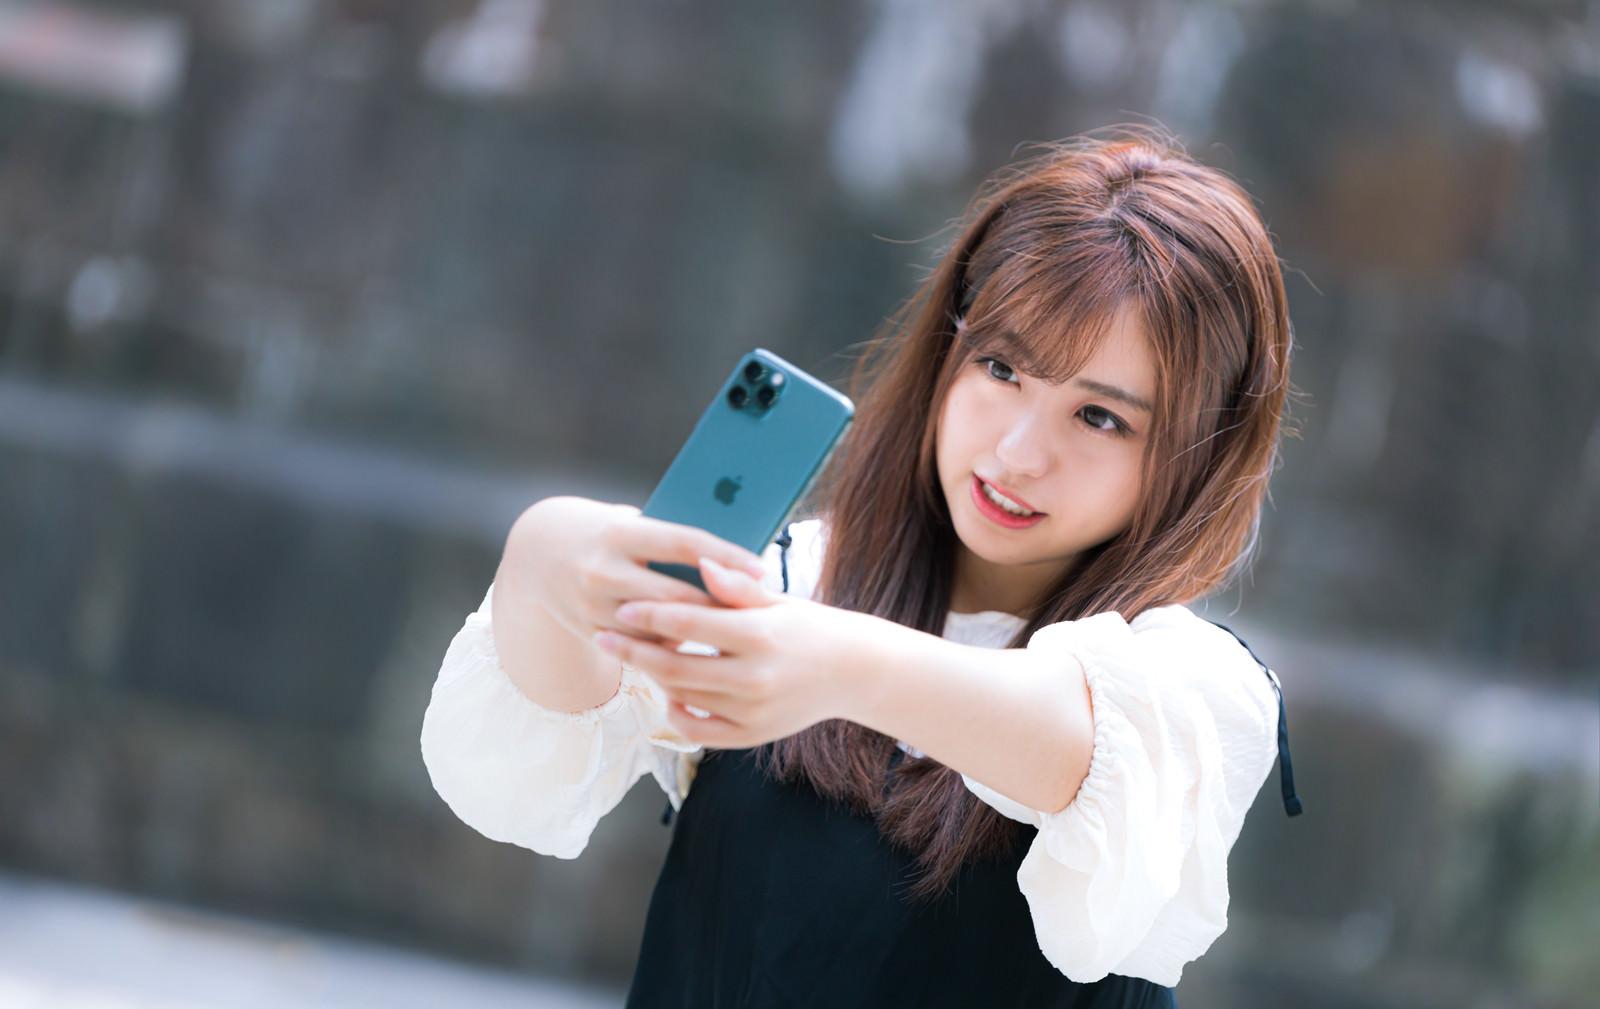 「iPhone 11 Pro で自撮り女子」の写真[モデル:河村友歌]